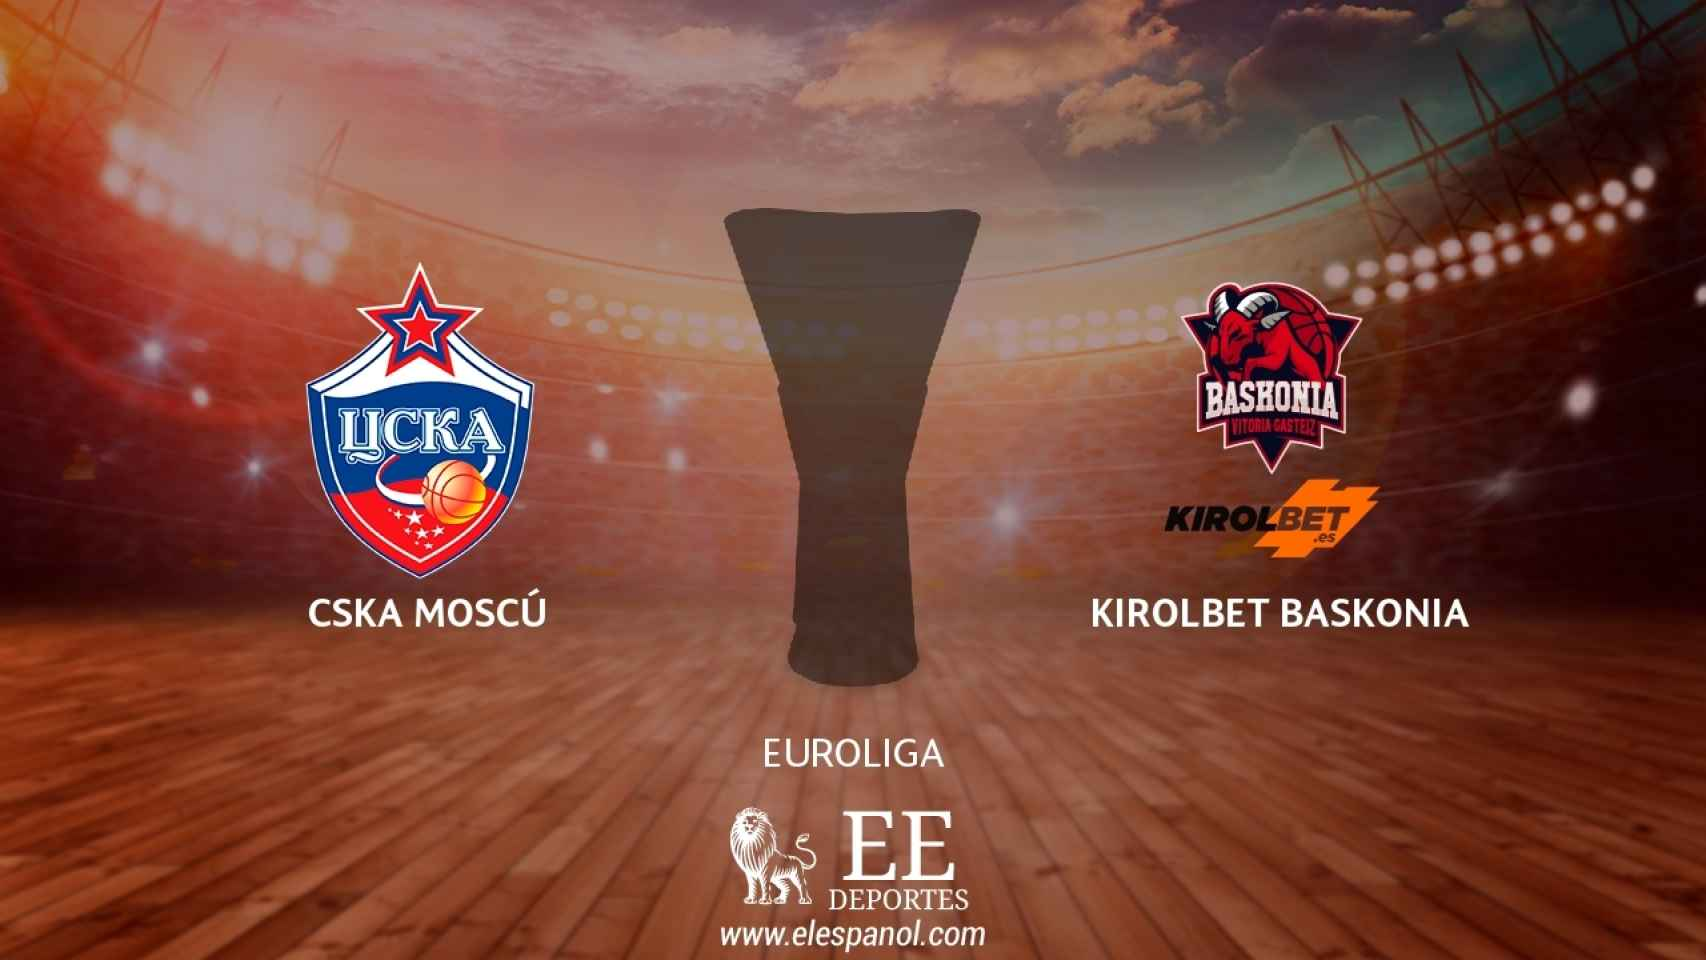 CSKA Moscú - Kirolbet Baskonia